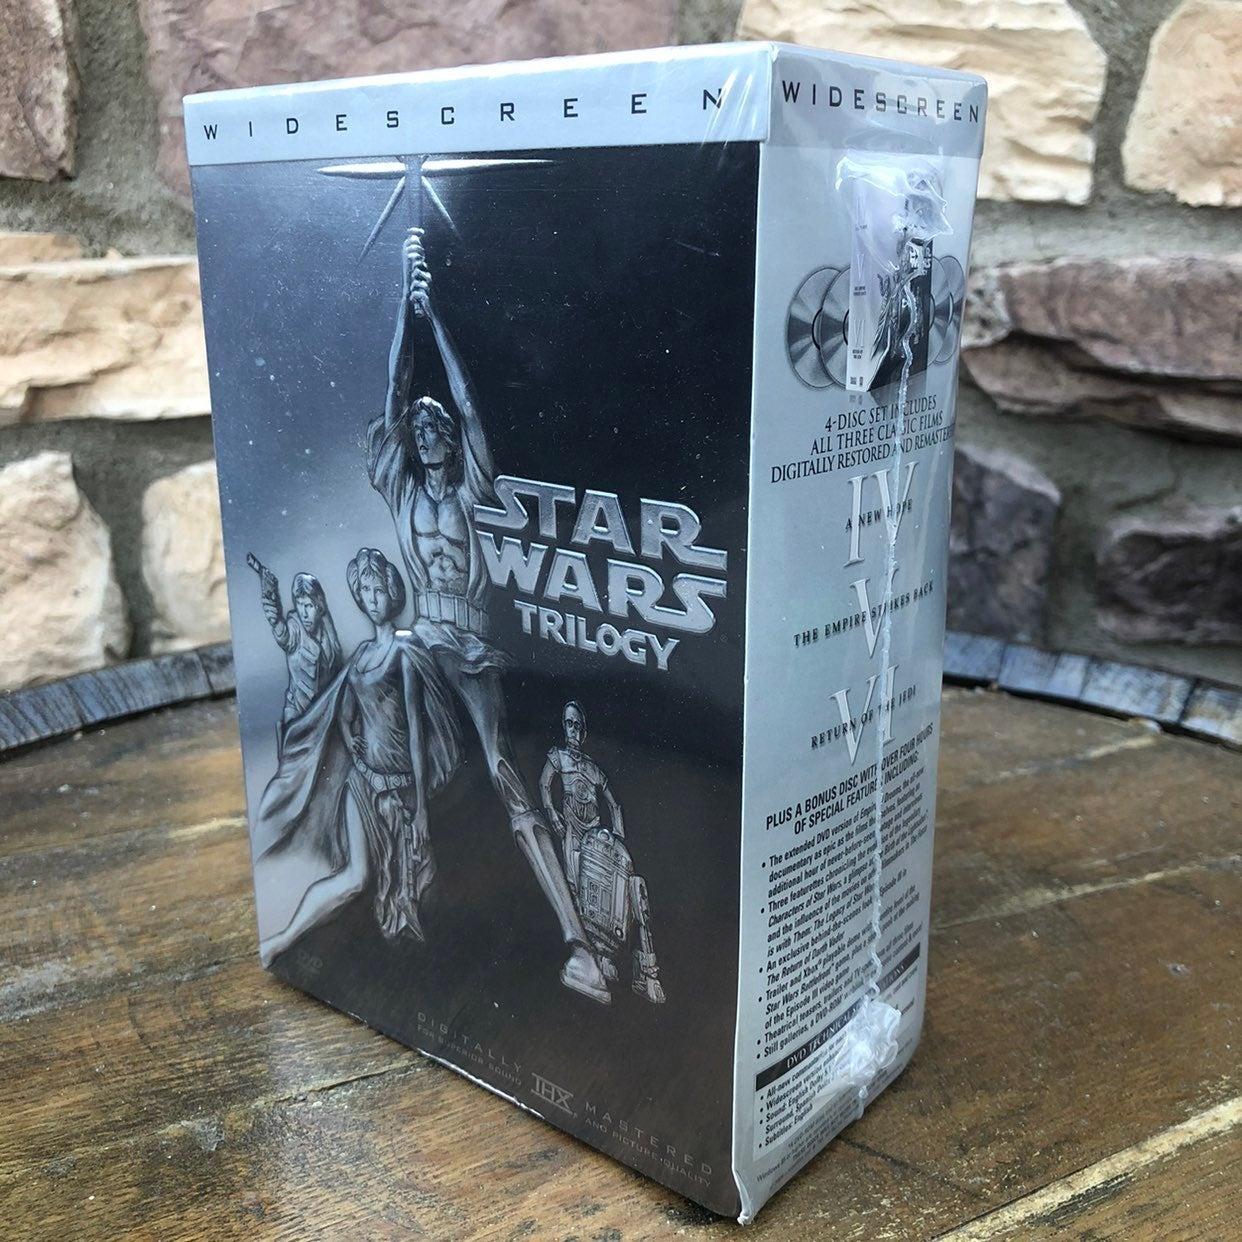 Star Wars Trilogy Widescreen IV V VI DVD